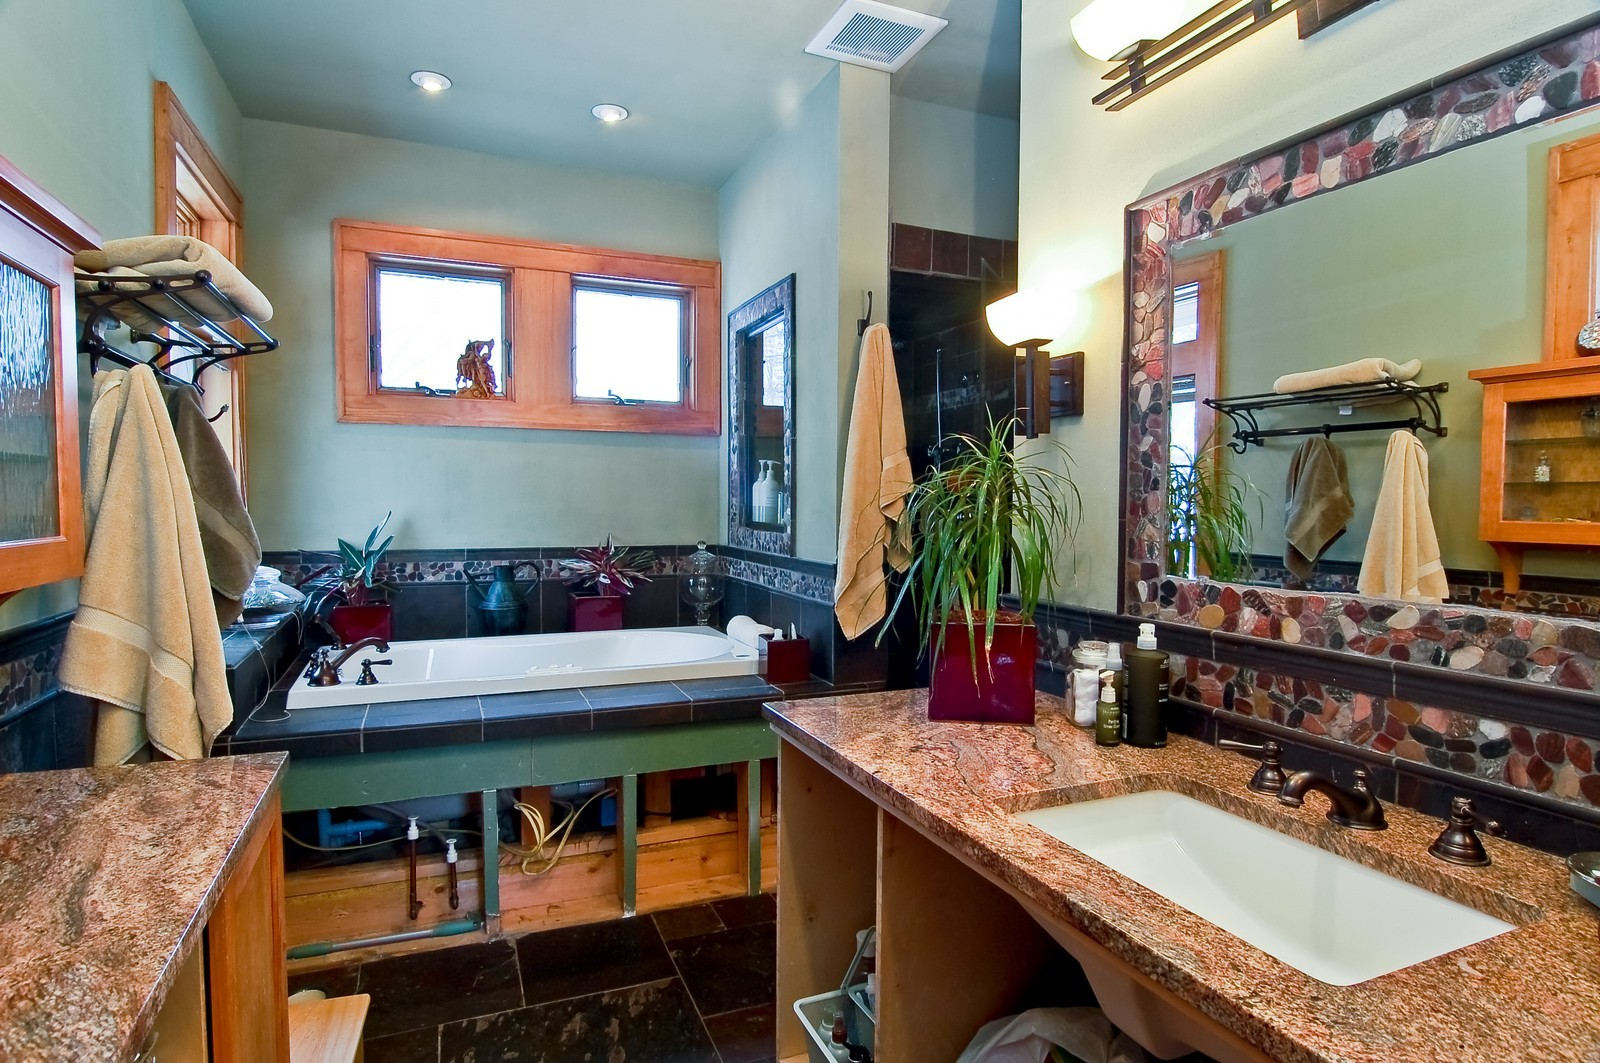 Real Estate Photography - 5012 Upton Avenue South, Minneapolis, MN, 55410 - Master Bathroom